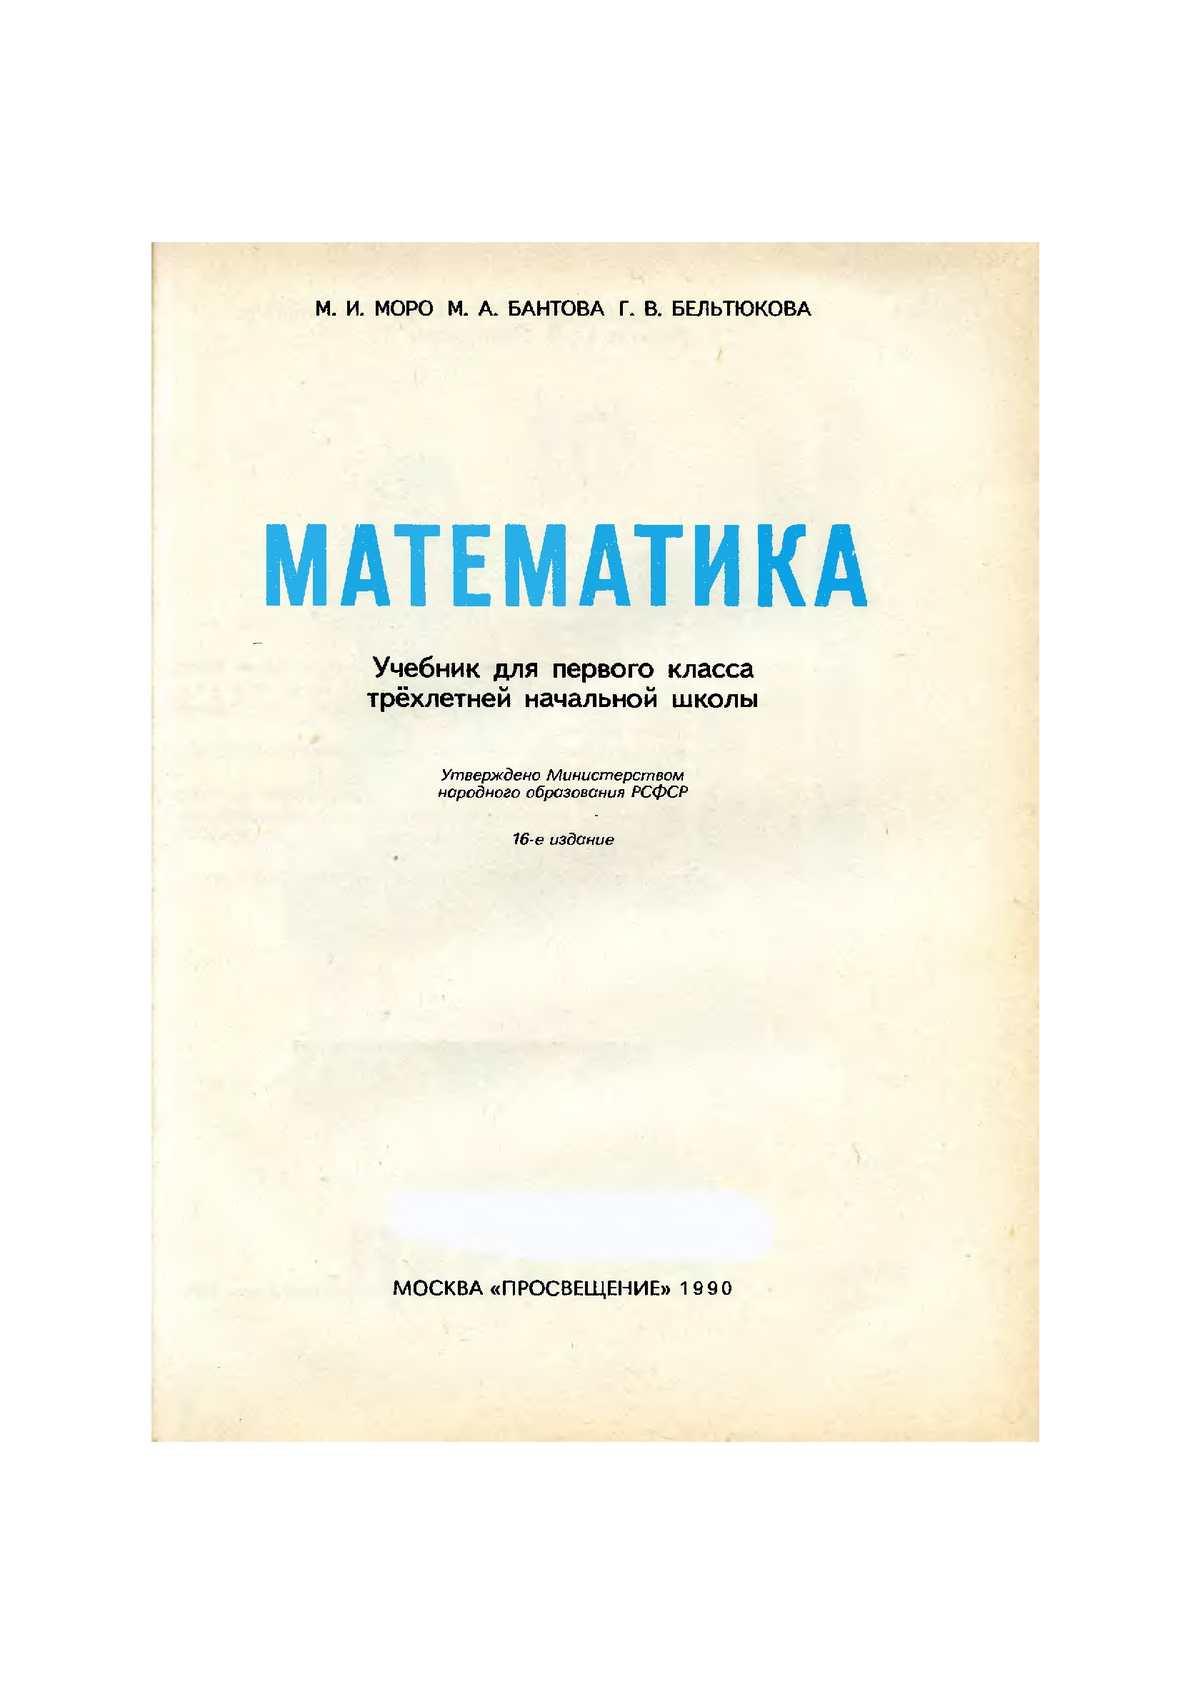 Matematika_1_Moro